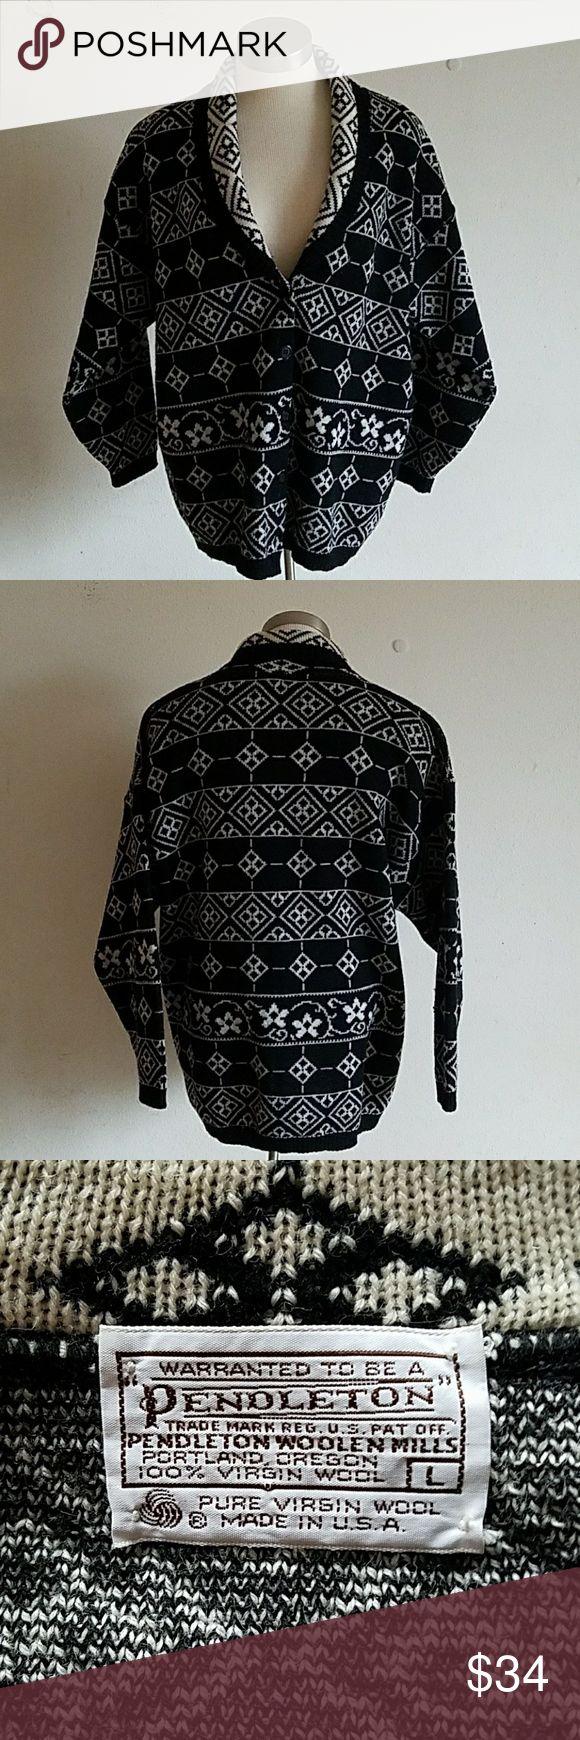 "Pendleton Woolen Mills Women's Cardigan Gently used. Pendleton Woolen Mills 5 button front cardigan. Floral and geometric pattern designs.   Measurements laying flat: Pit to pit - 22"" Shoulder to bottom hem - 26.75"" Pendleton Sweaters Cardigans"